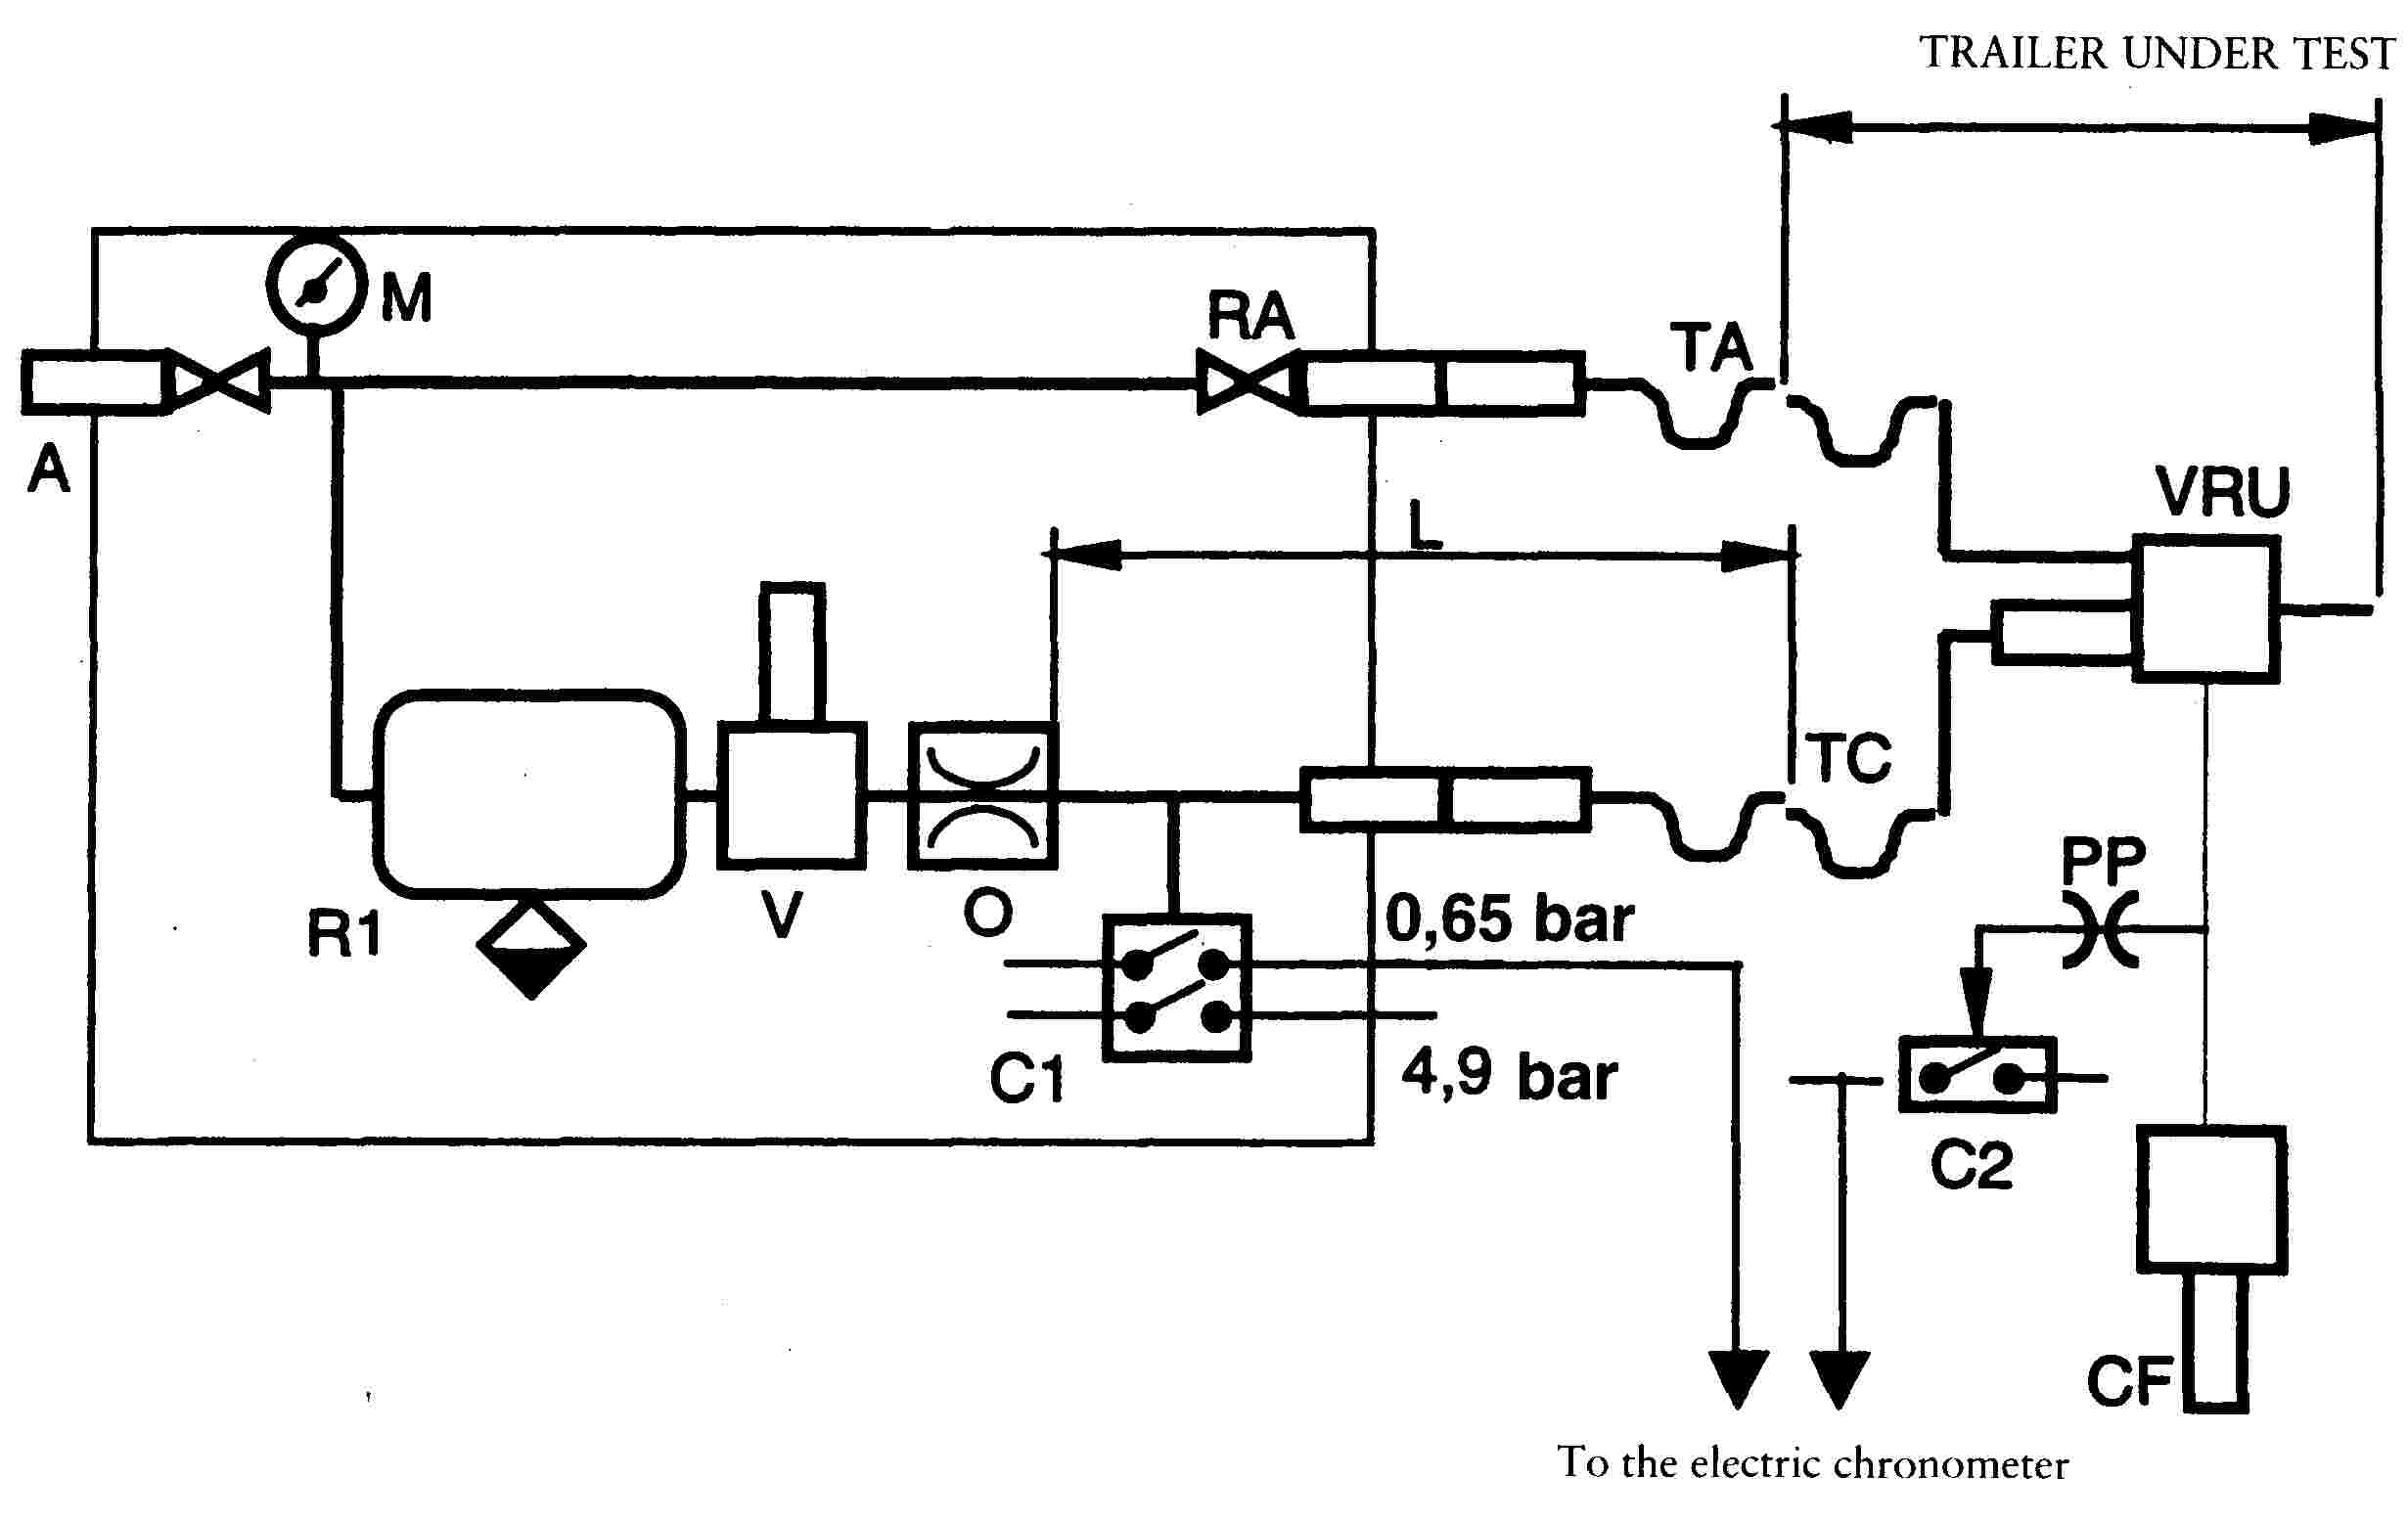 Eur Lex 01971l0320 20070101 En J 380 Circuit Board Wiring Diagram A Supply Connection With Shut Off Valve